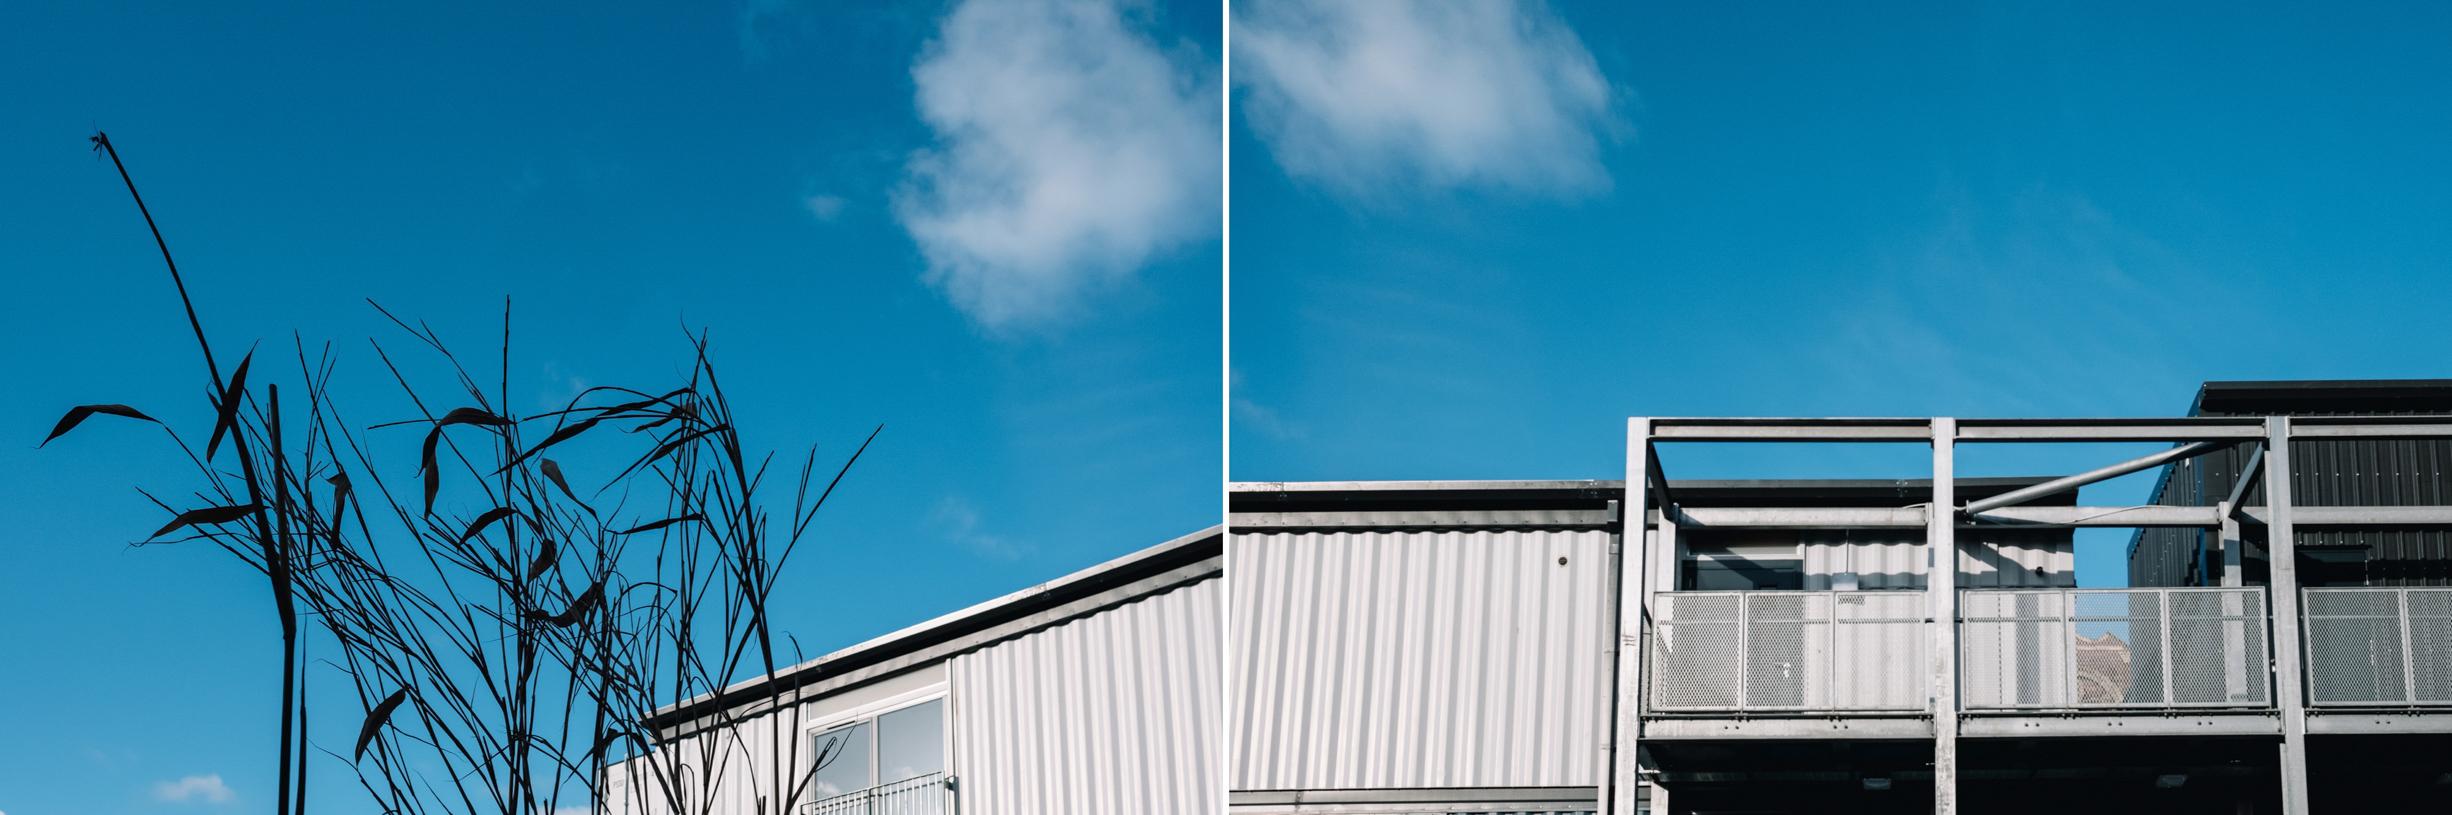 03-blue-skies-Glasgow.jpg